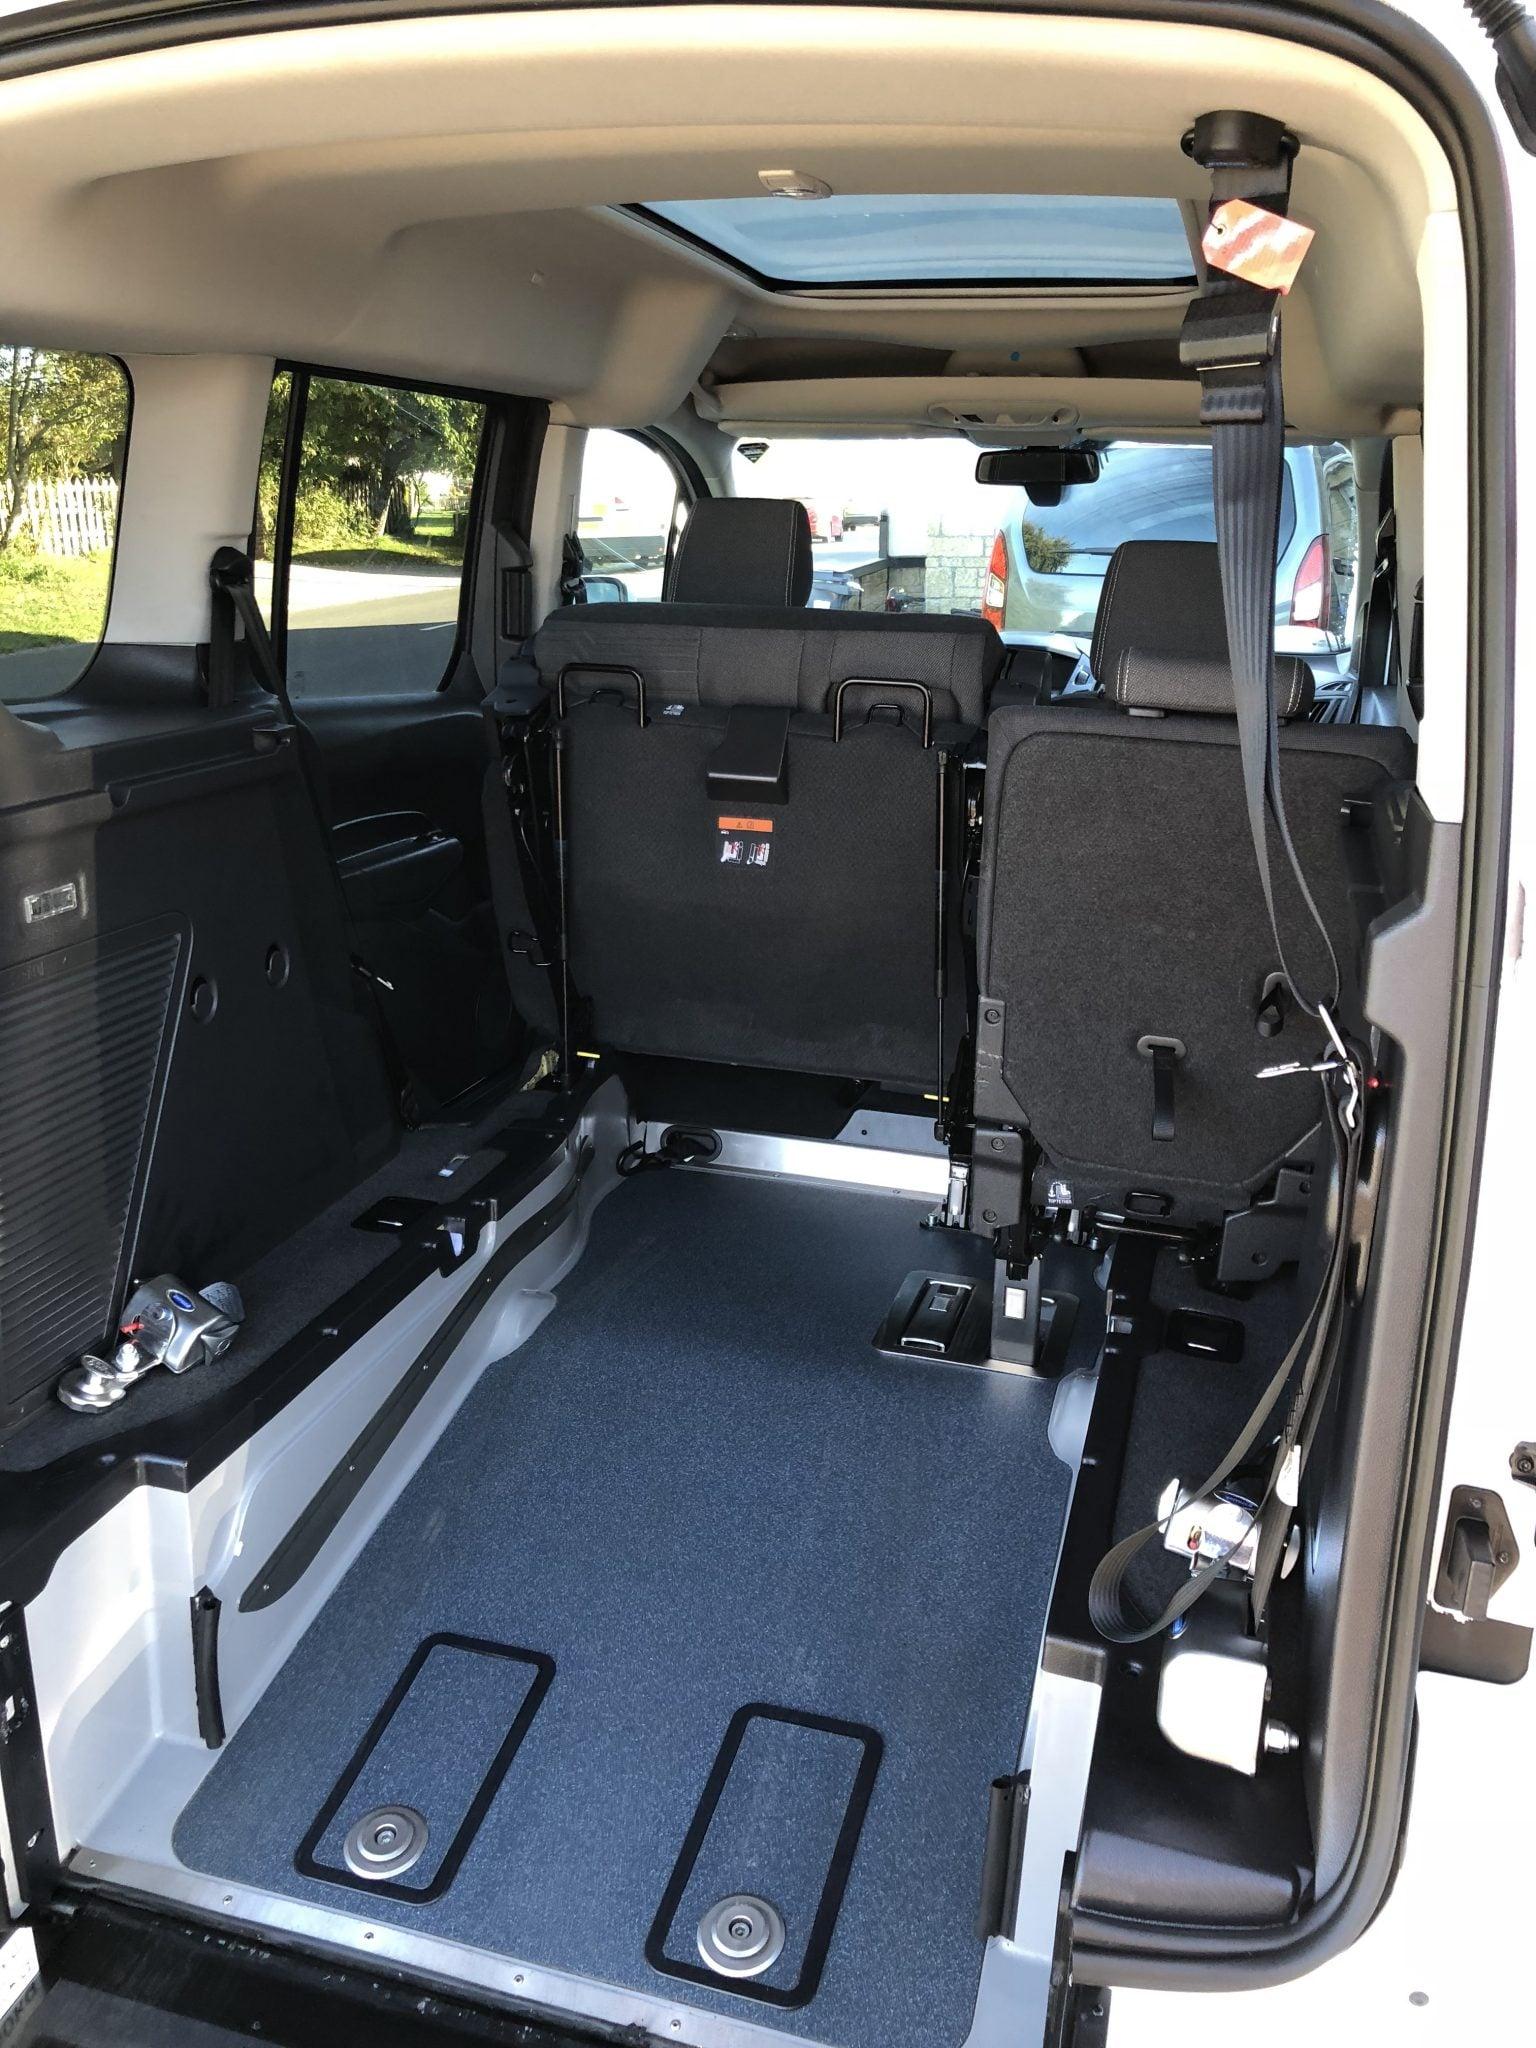 Ford Connect Tourneo Automatic 1 6l Petrol Ye64 Jxz